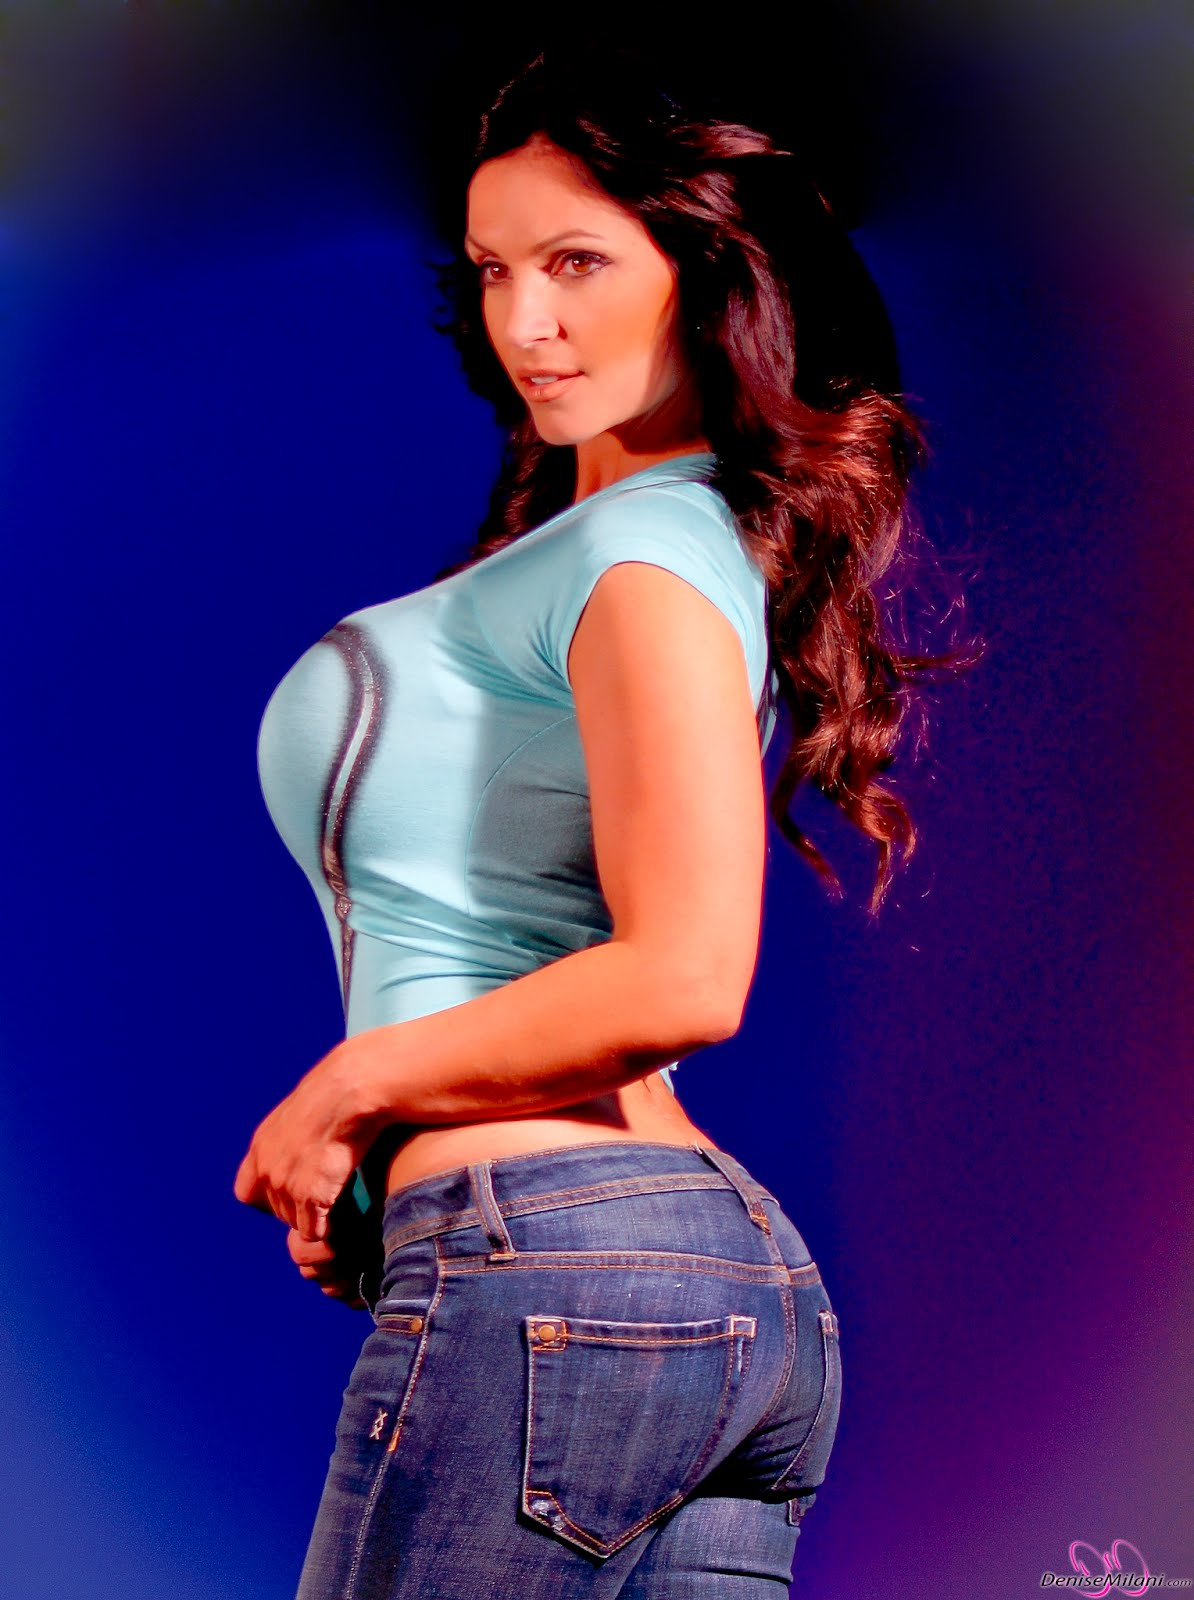 denise milani blue dress - photo #5